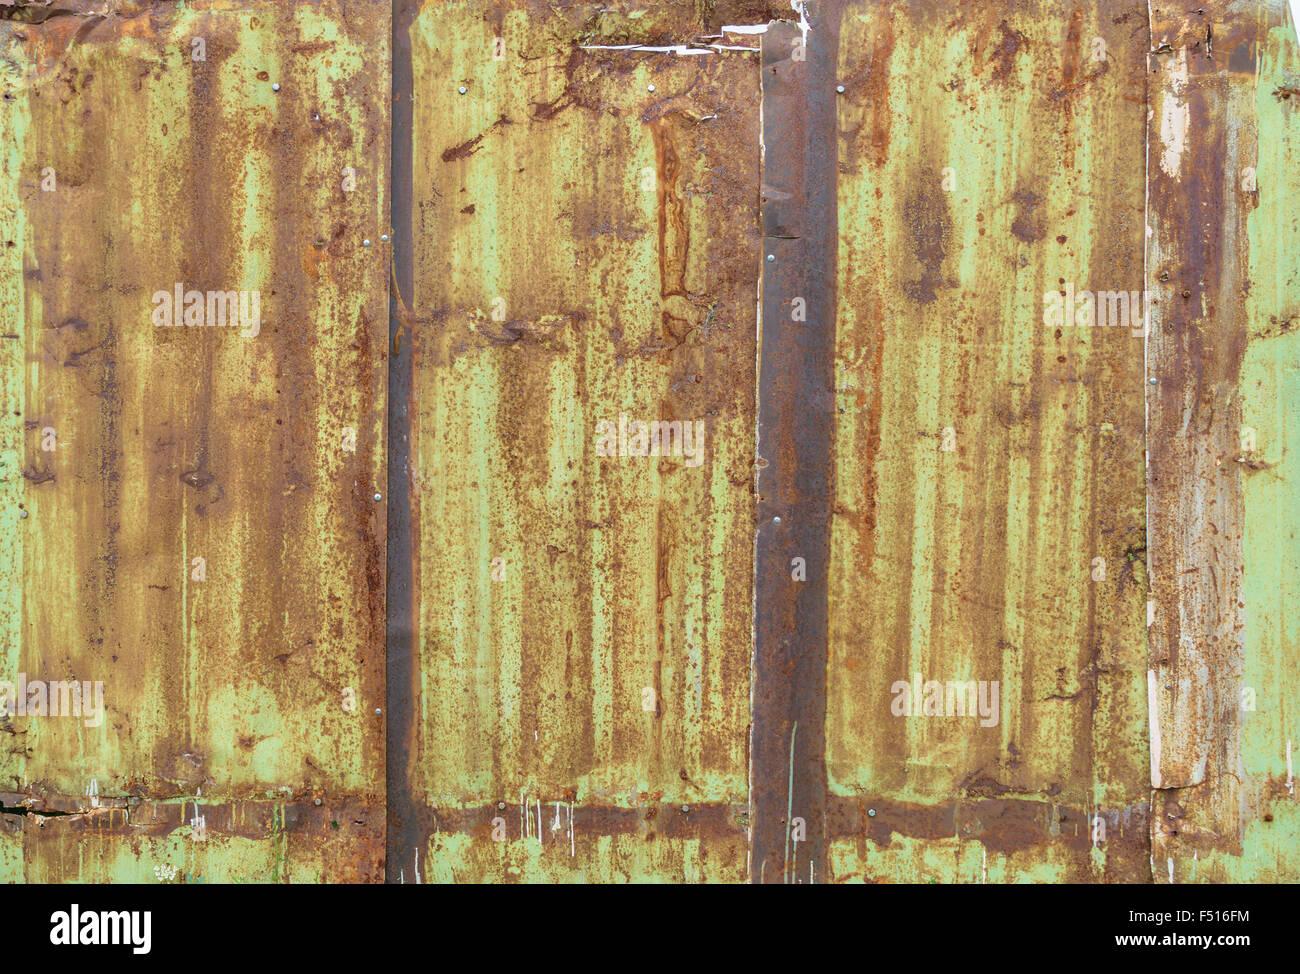 Sheet Metal Fence Stock Photos & Sheet Metal Fence Stock Images - Alamy